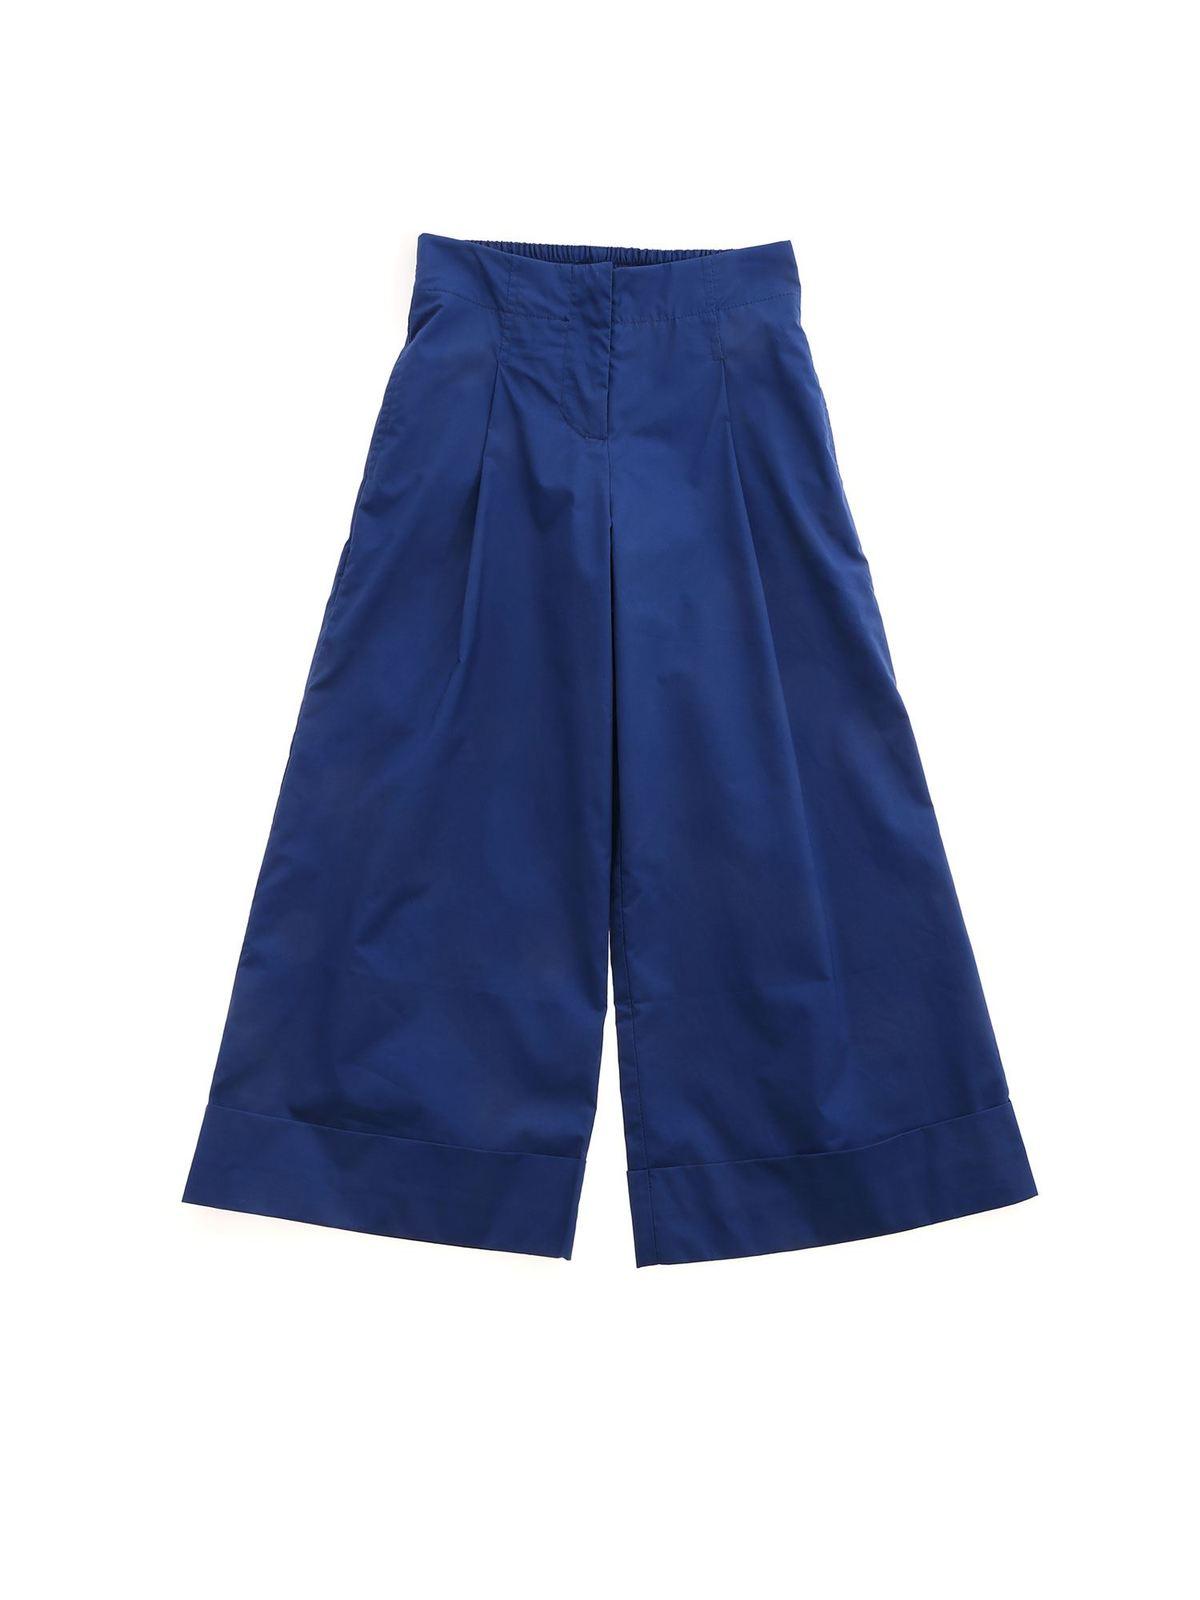 Monnalisa Cottons TURNED-UP HEM PANTS IN BLUE